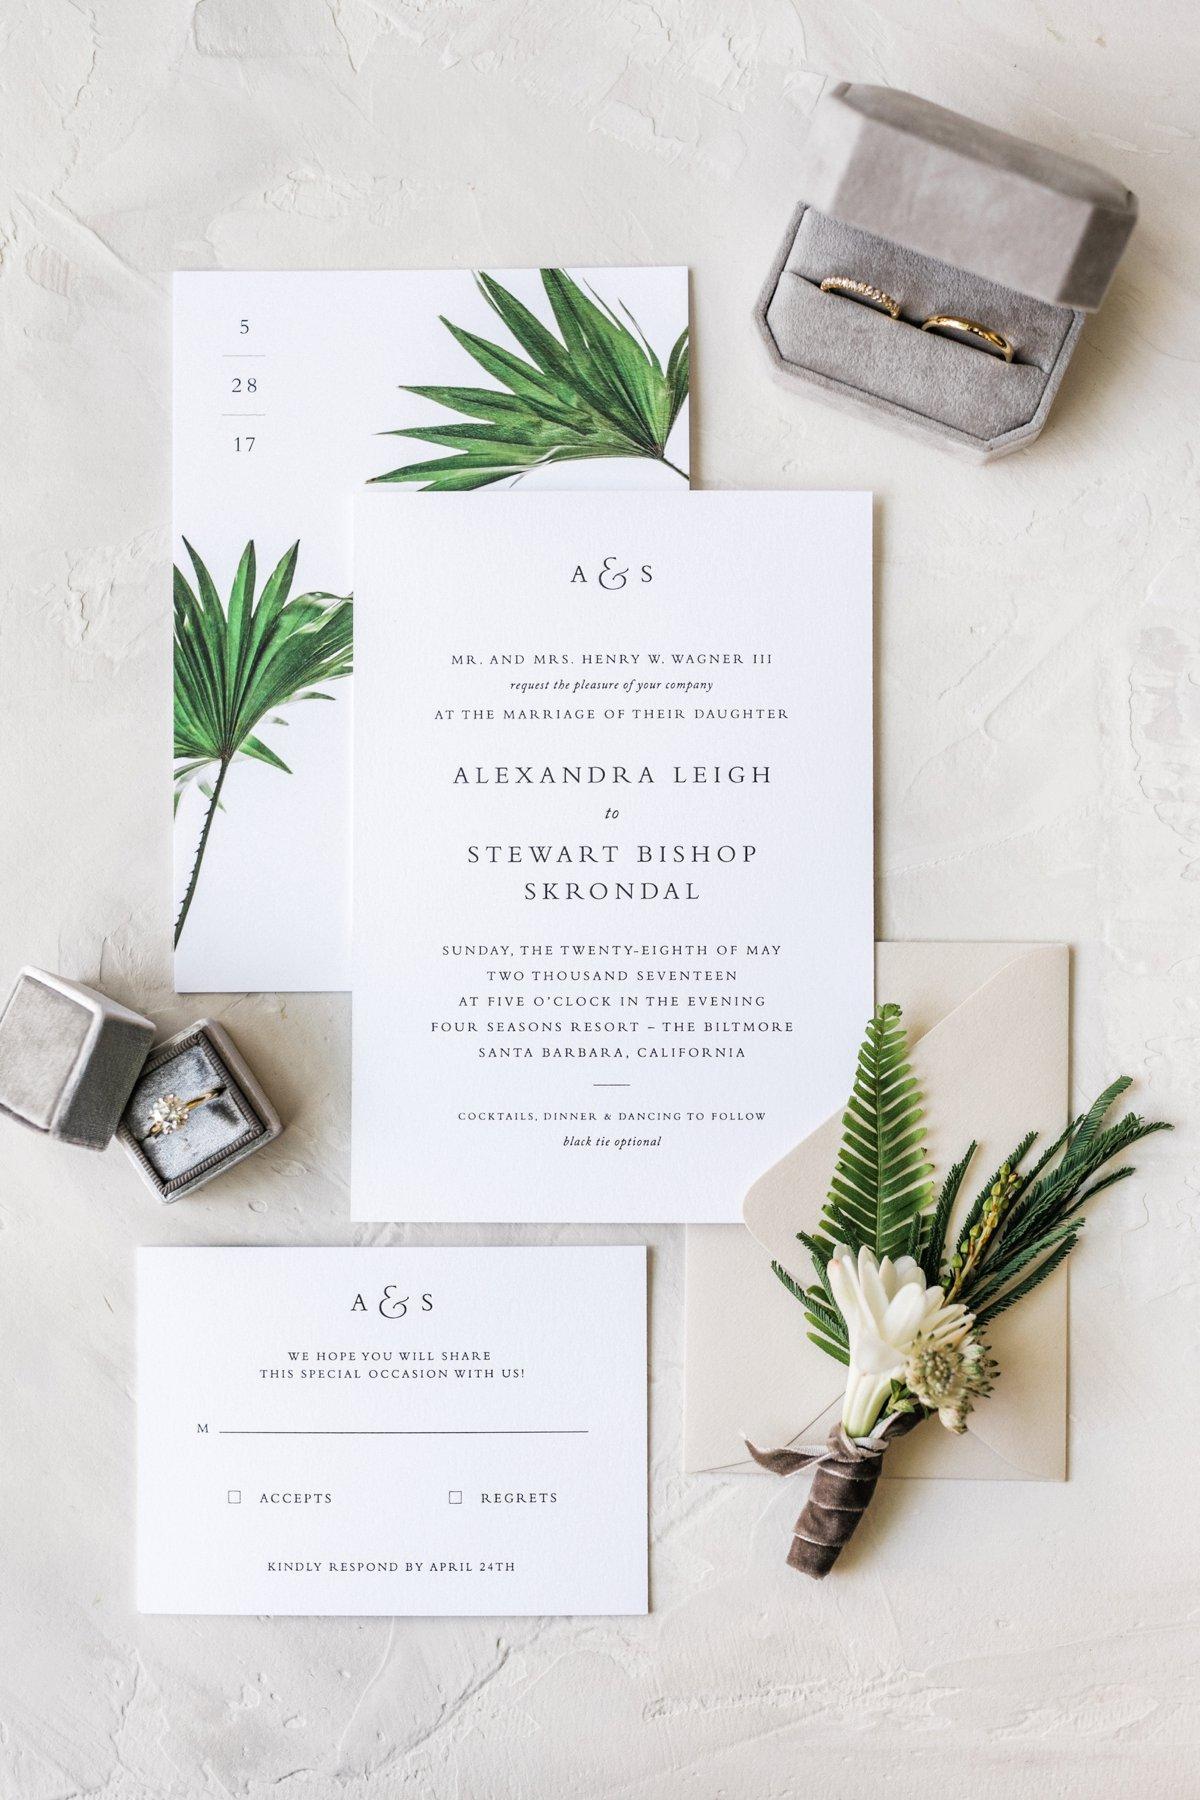 modern white wedding invitations - photo by Anna Delores http://ruffledblog.com/chic-modern-wedding-at-four-seasons-santa-barbara